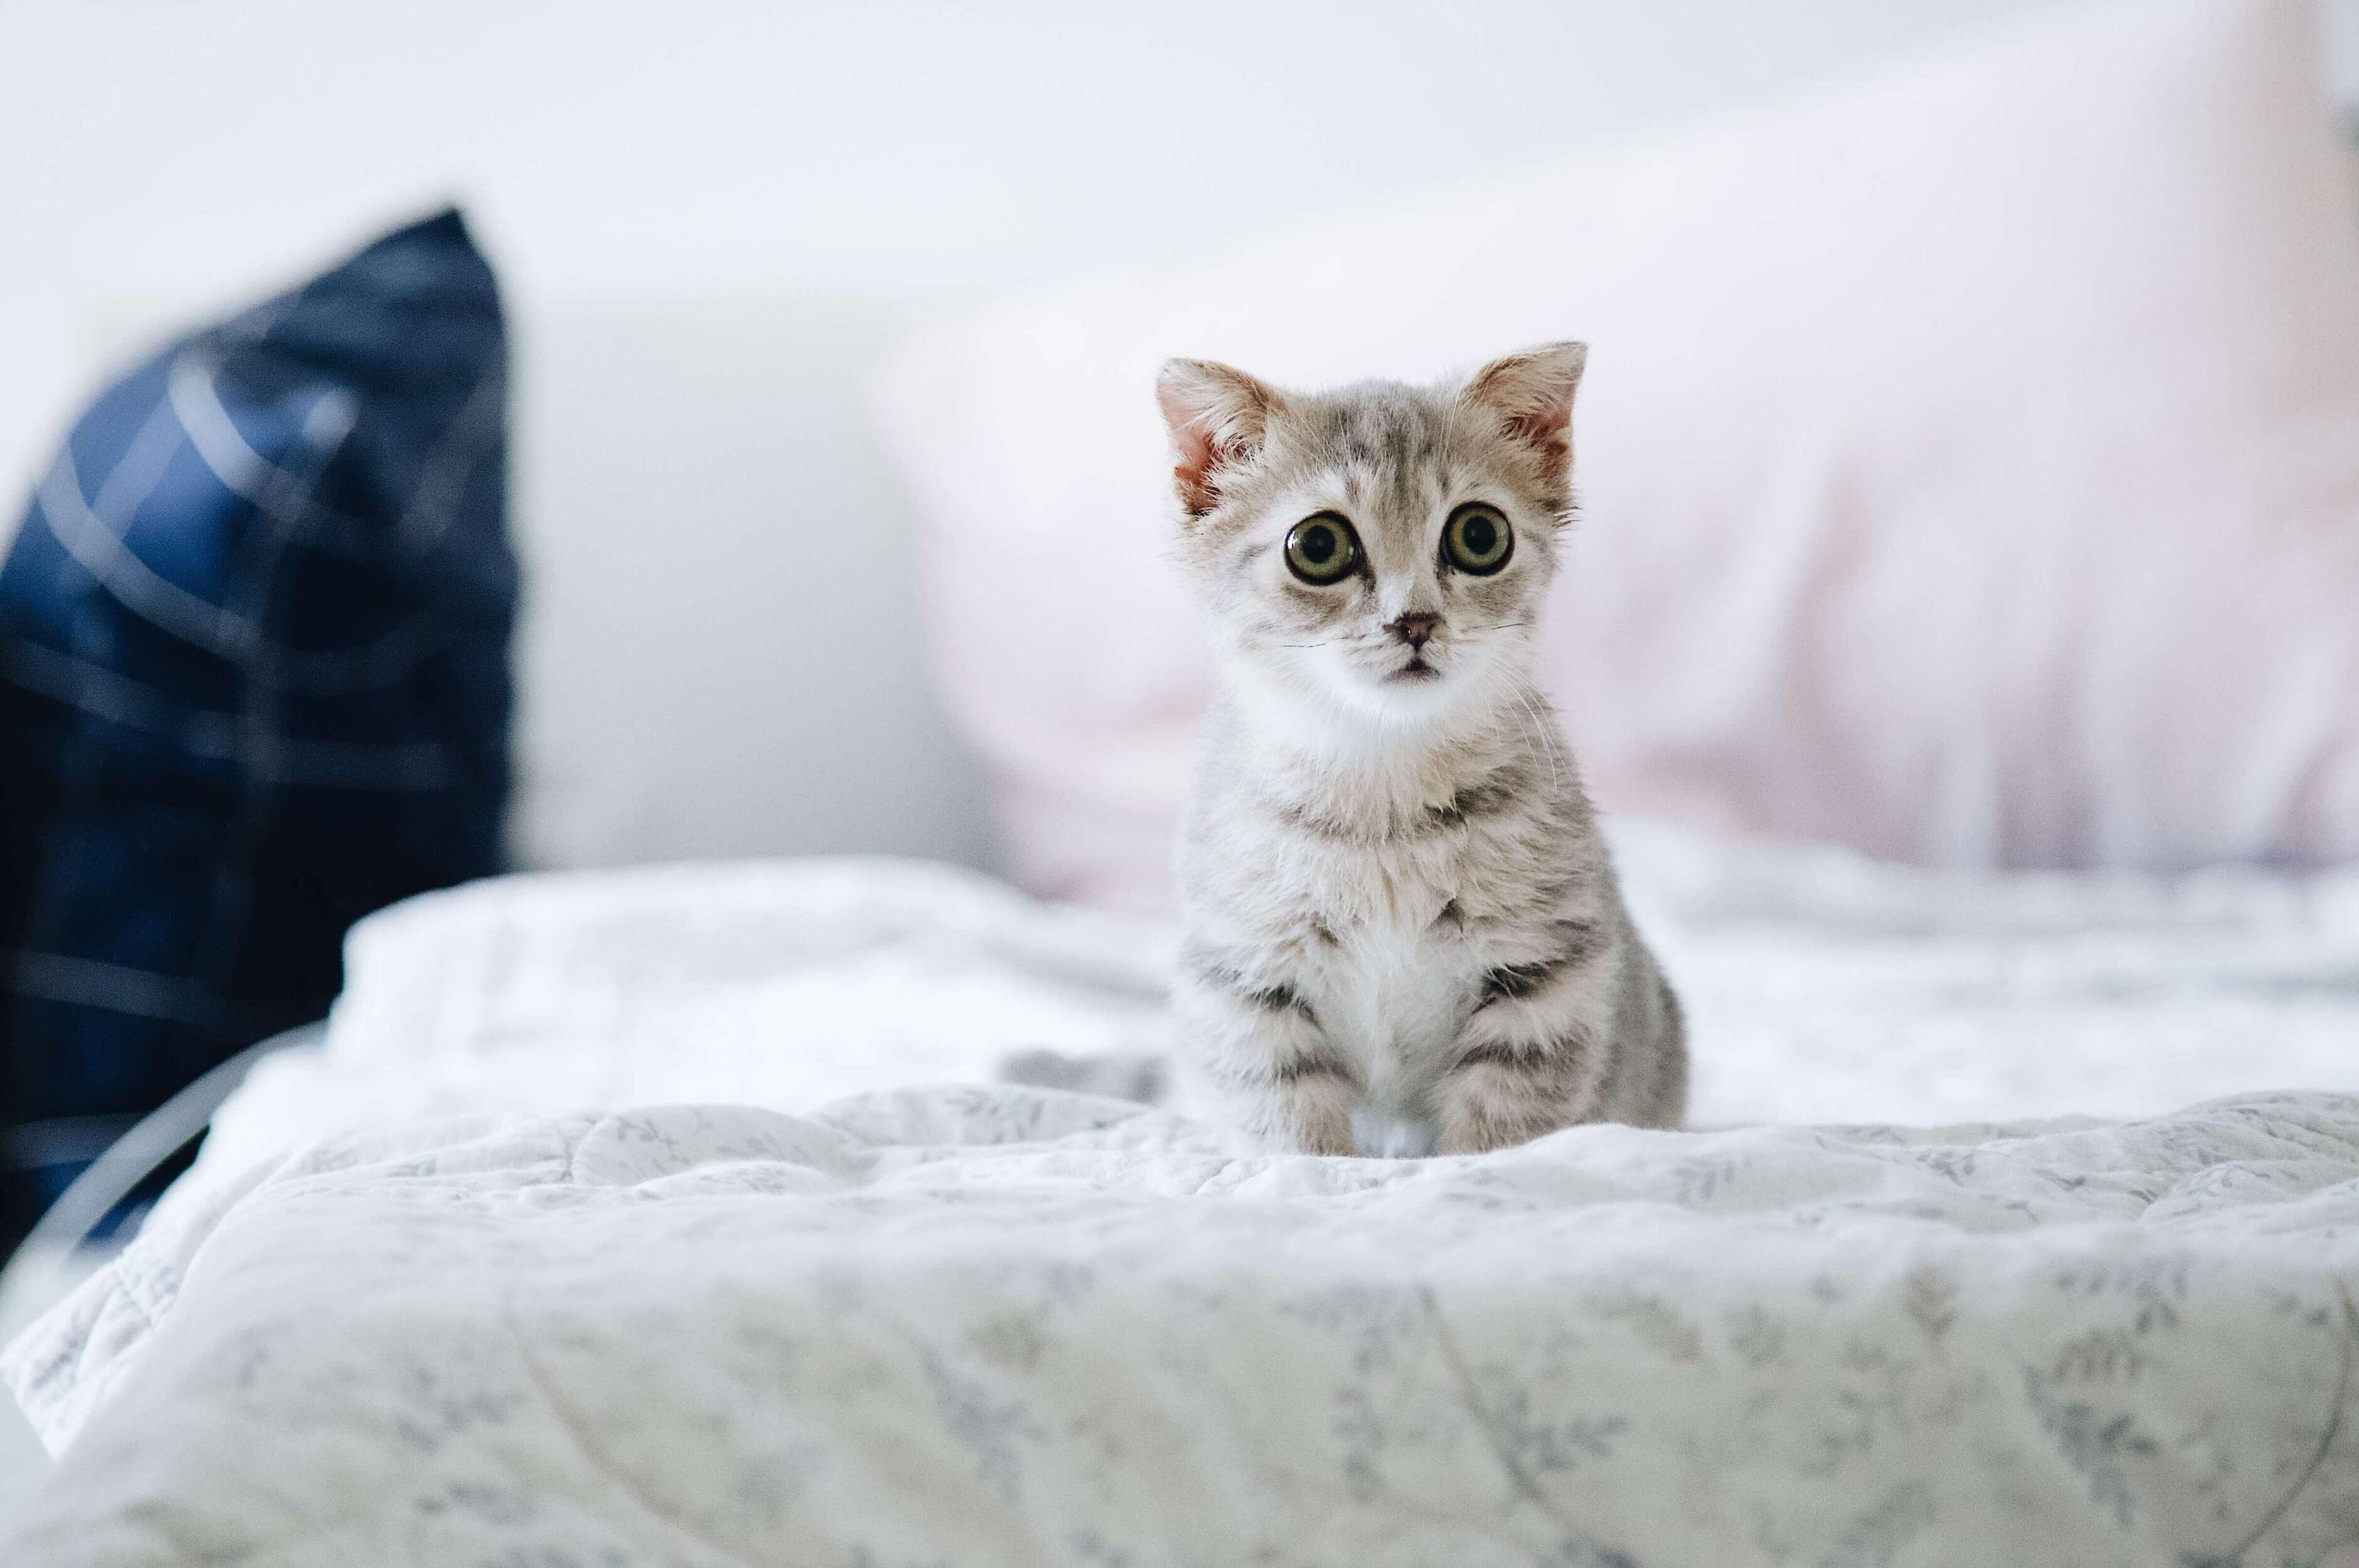 yatakta, korkmuş yavru kedi